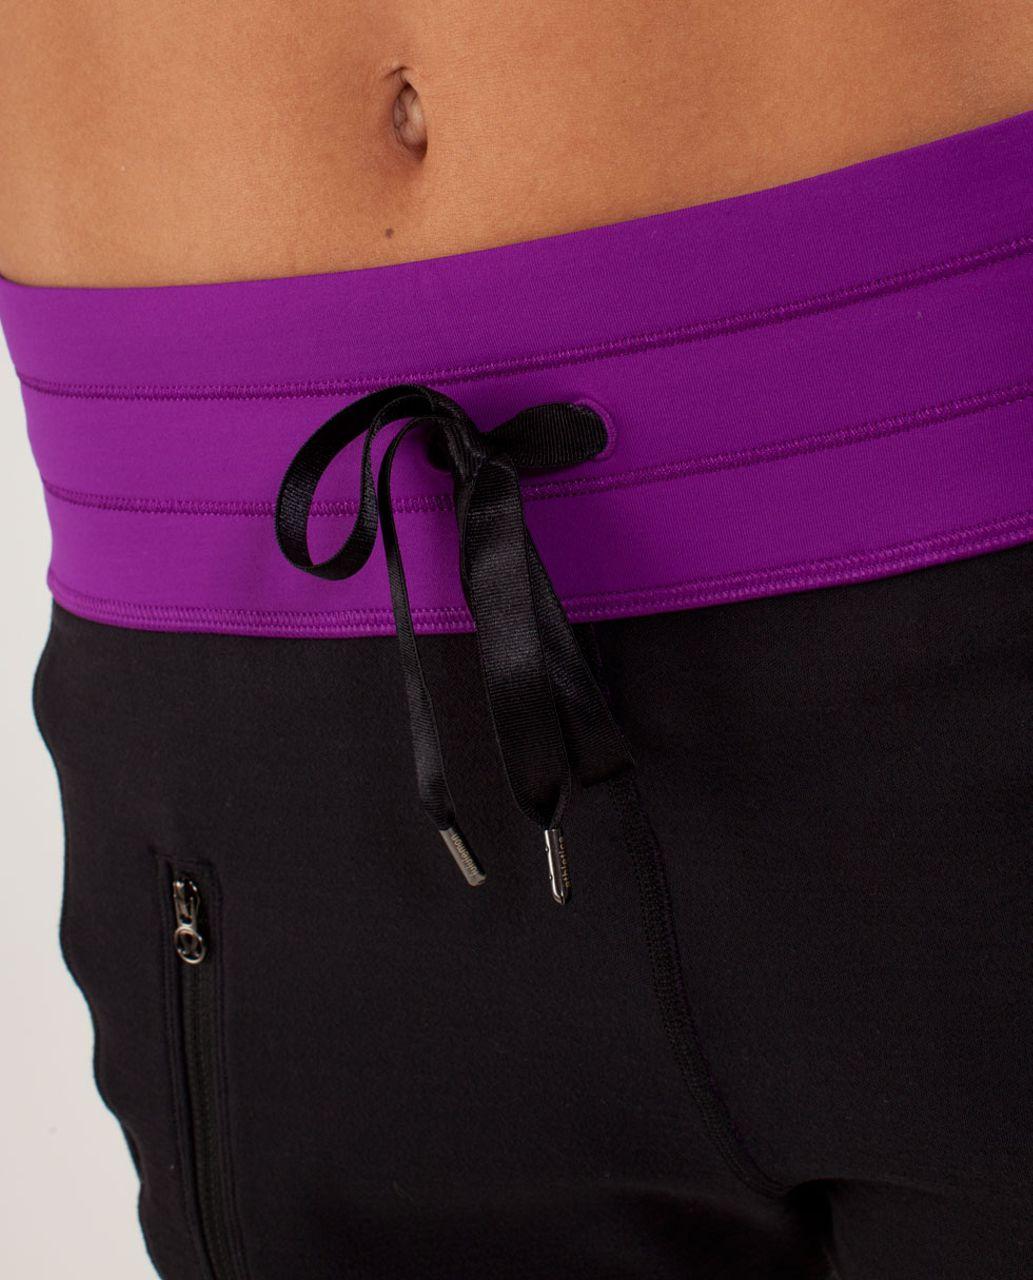 Lululemon Run:  Make A Move Pant - Black / Tender Violet